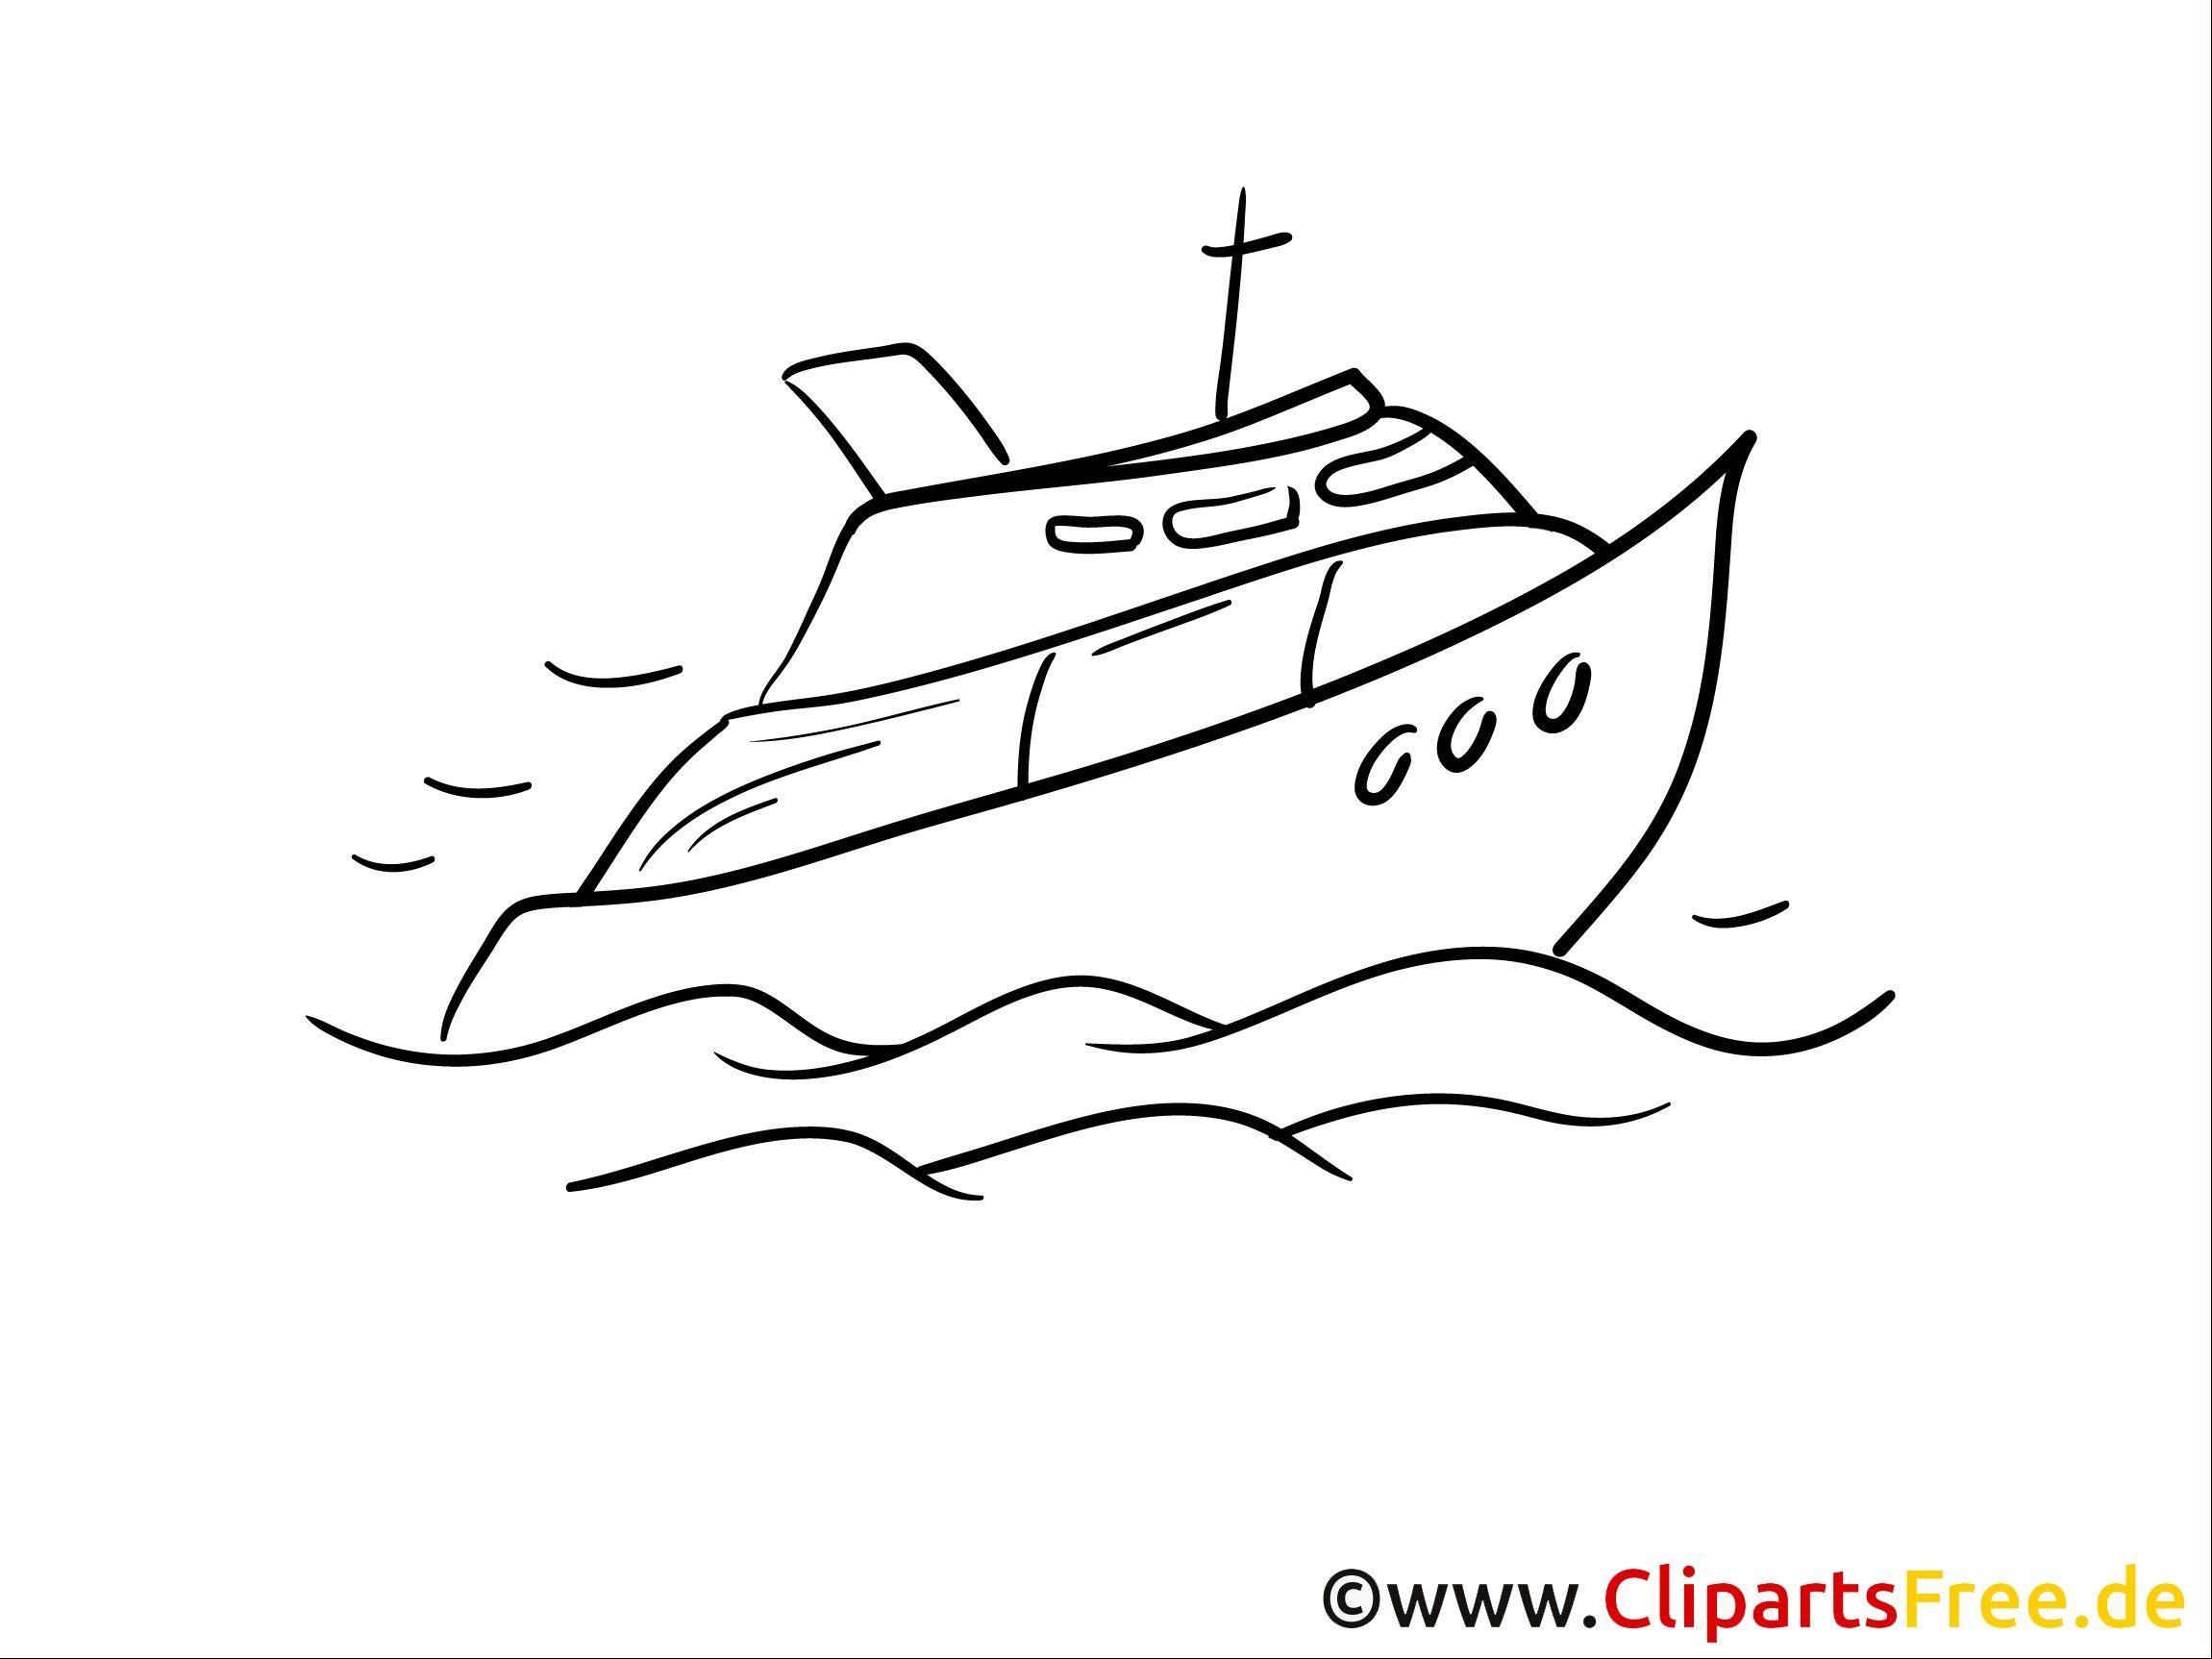 neu ausmalbilder schiff  ausmalbilder ausmalen